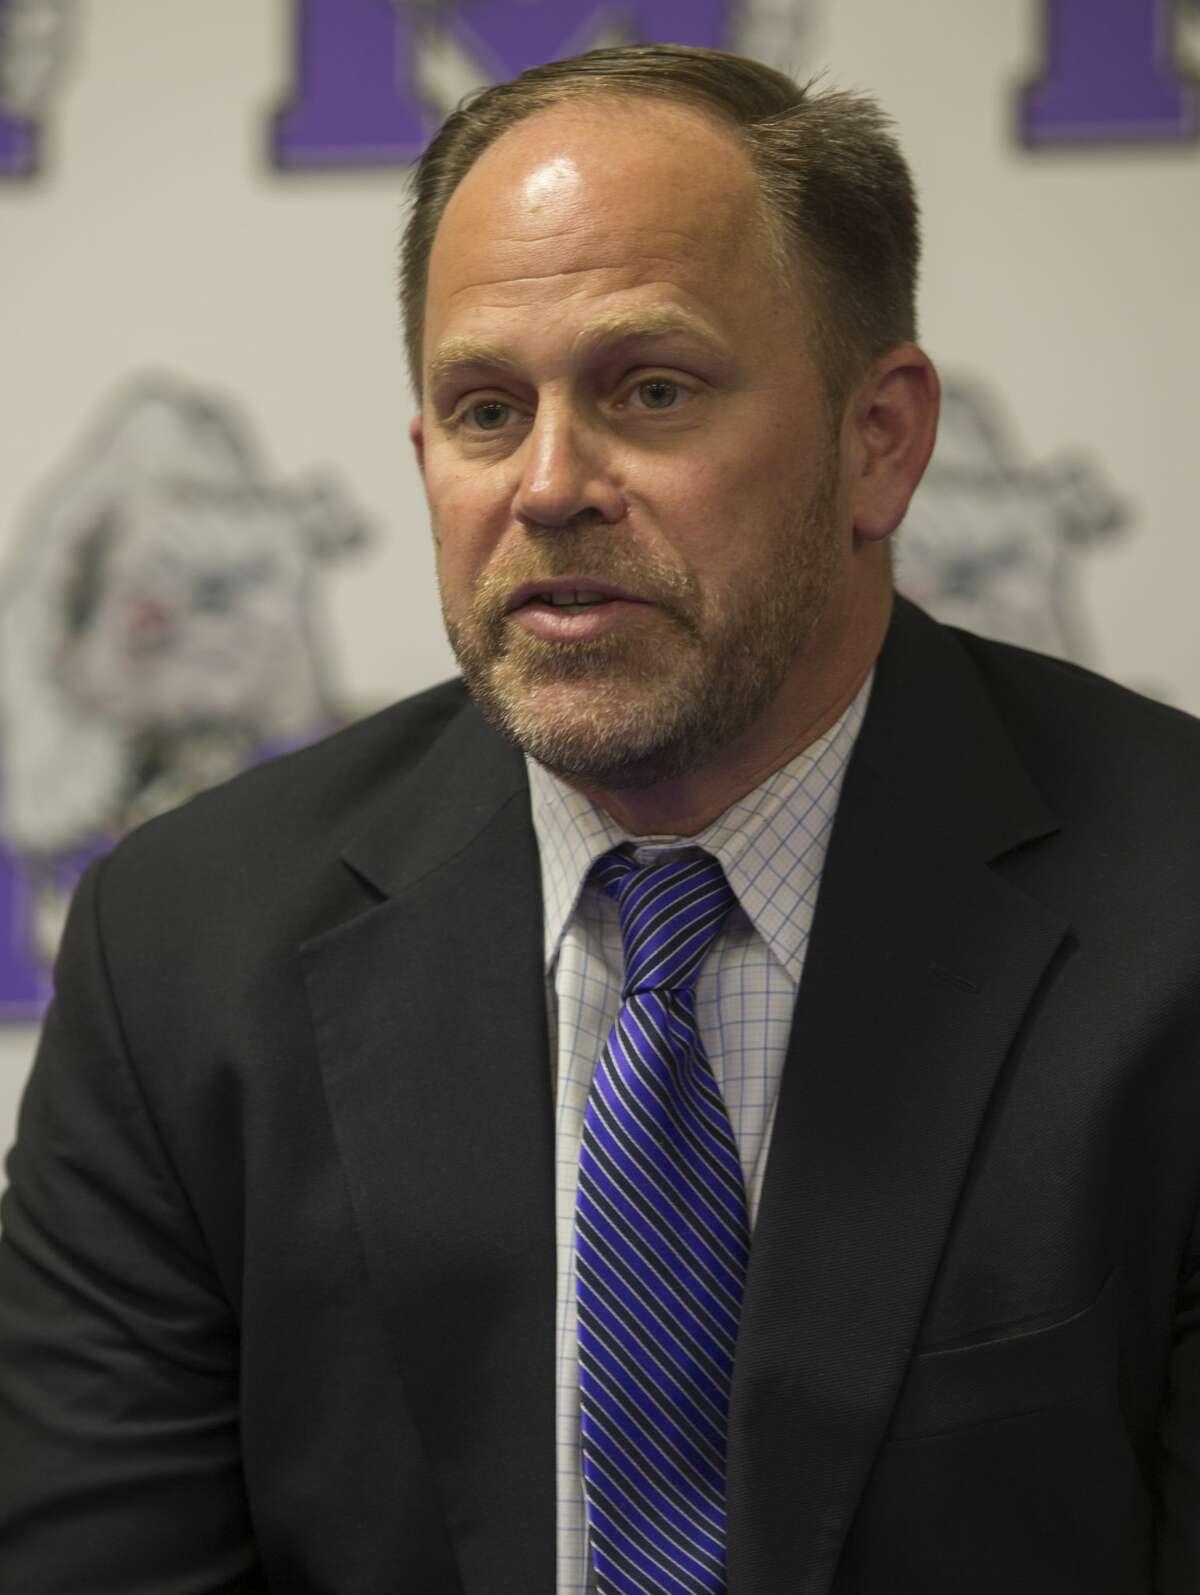 Coach Tim Anuszkiewicz was named MHS head football coach Wednesday 02-22-17 at Midland High School. Tim Fischer/Reporter-Telegram